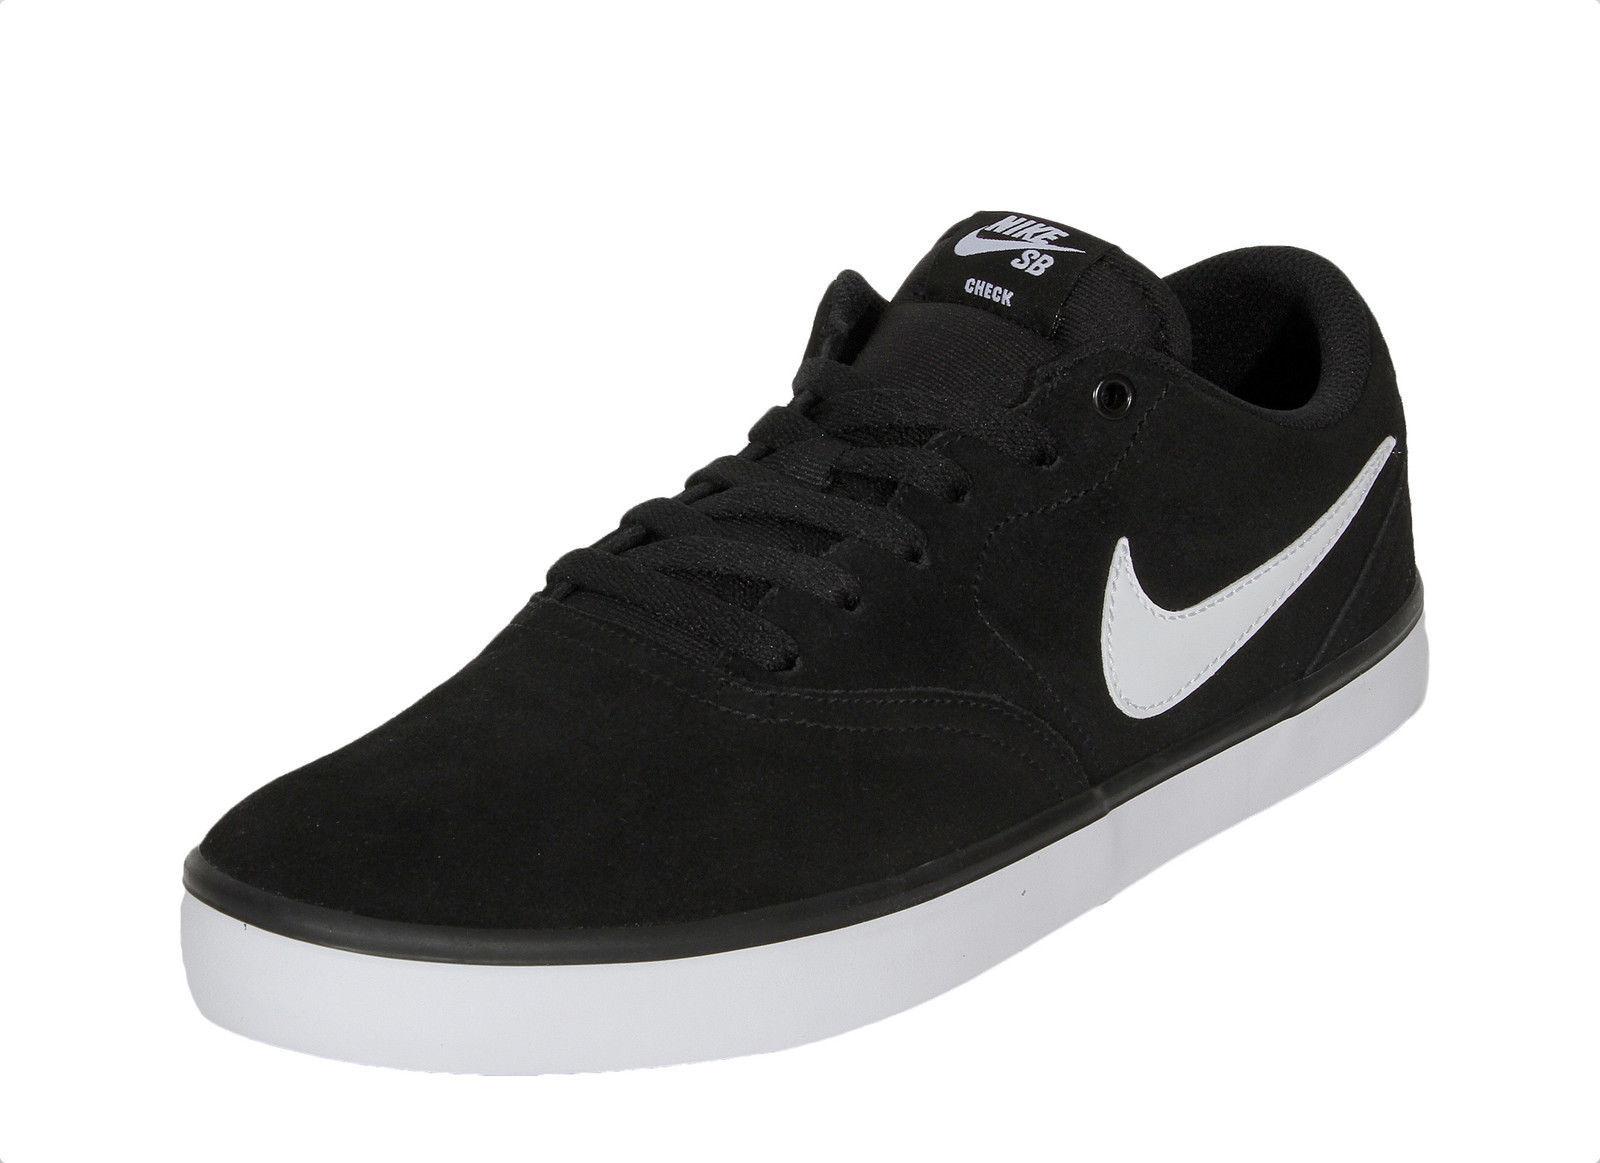 Nike SB check Solar hombre Negro Blanco 843895 001 001 001 nuevo 16db7d